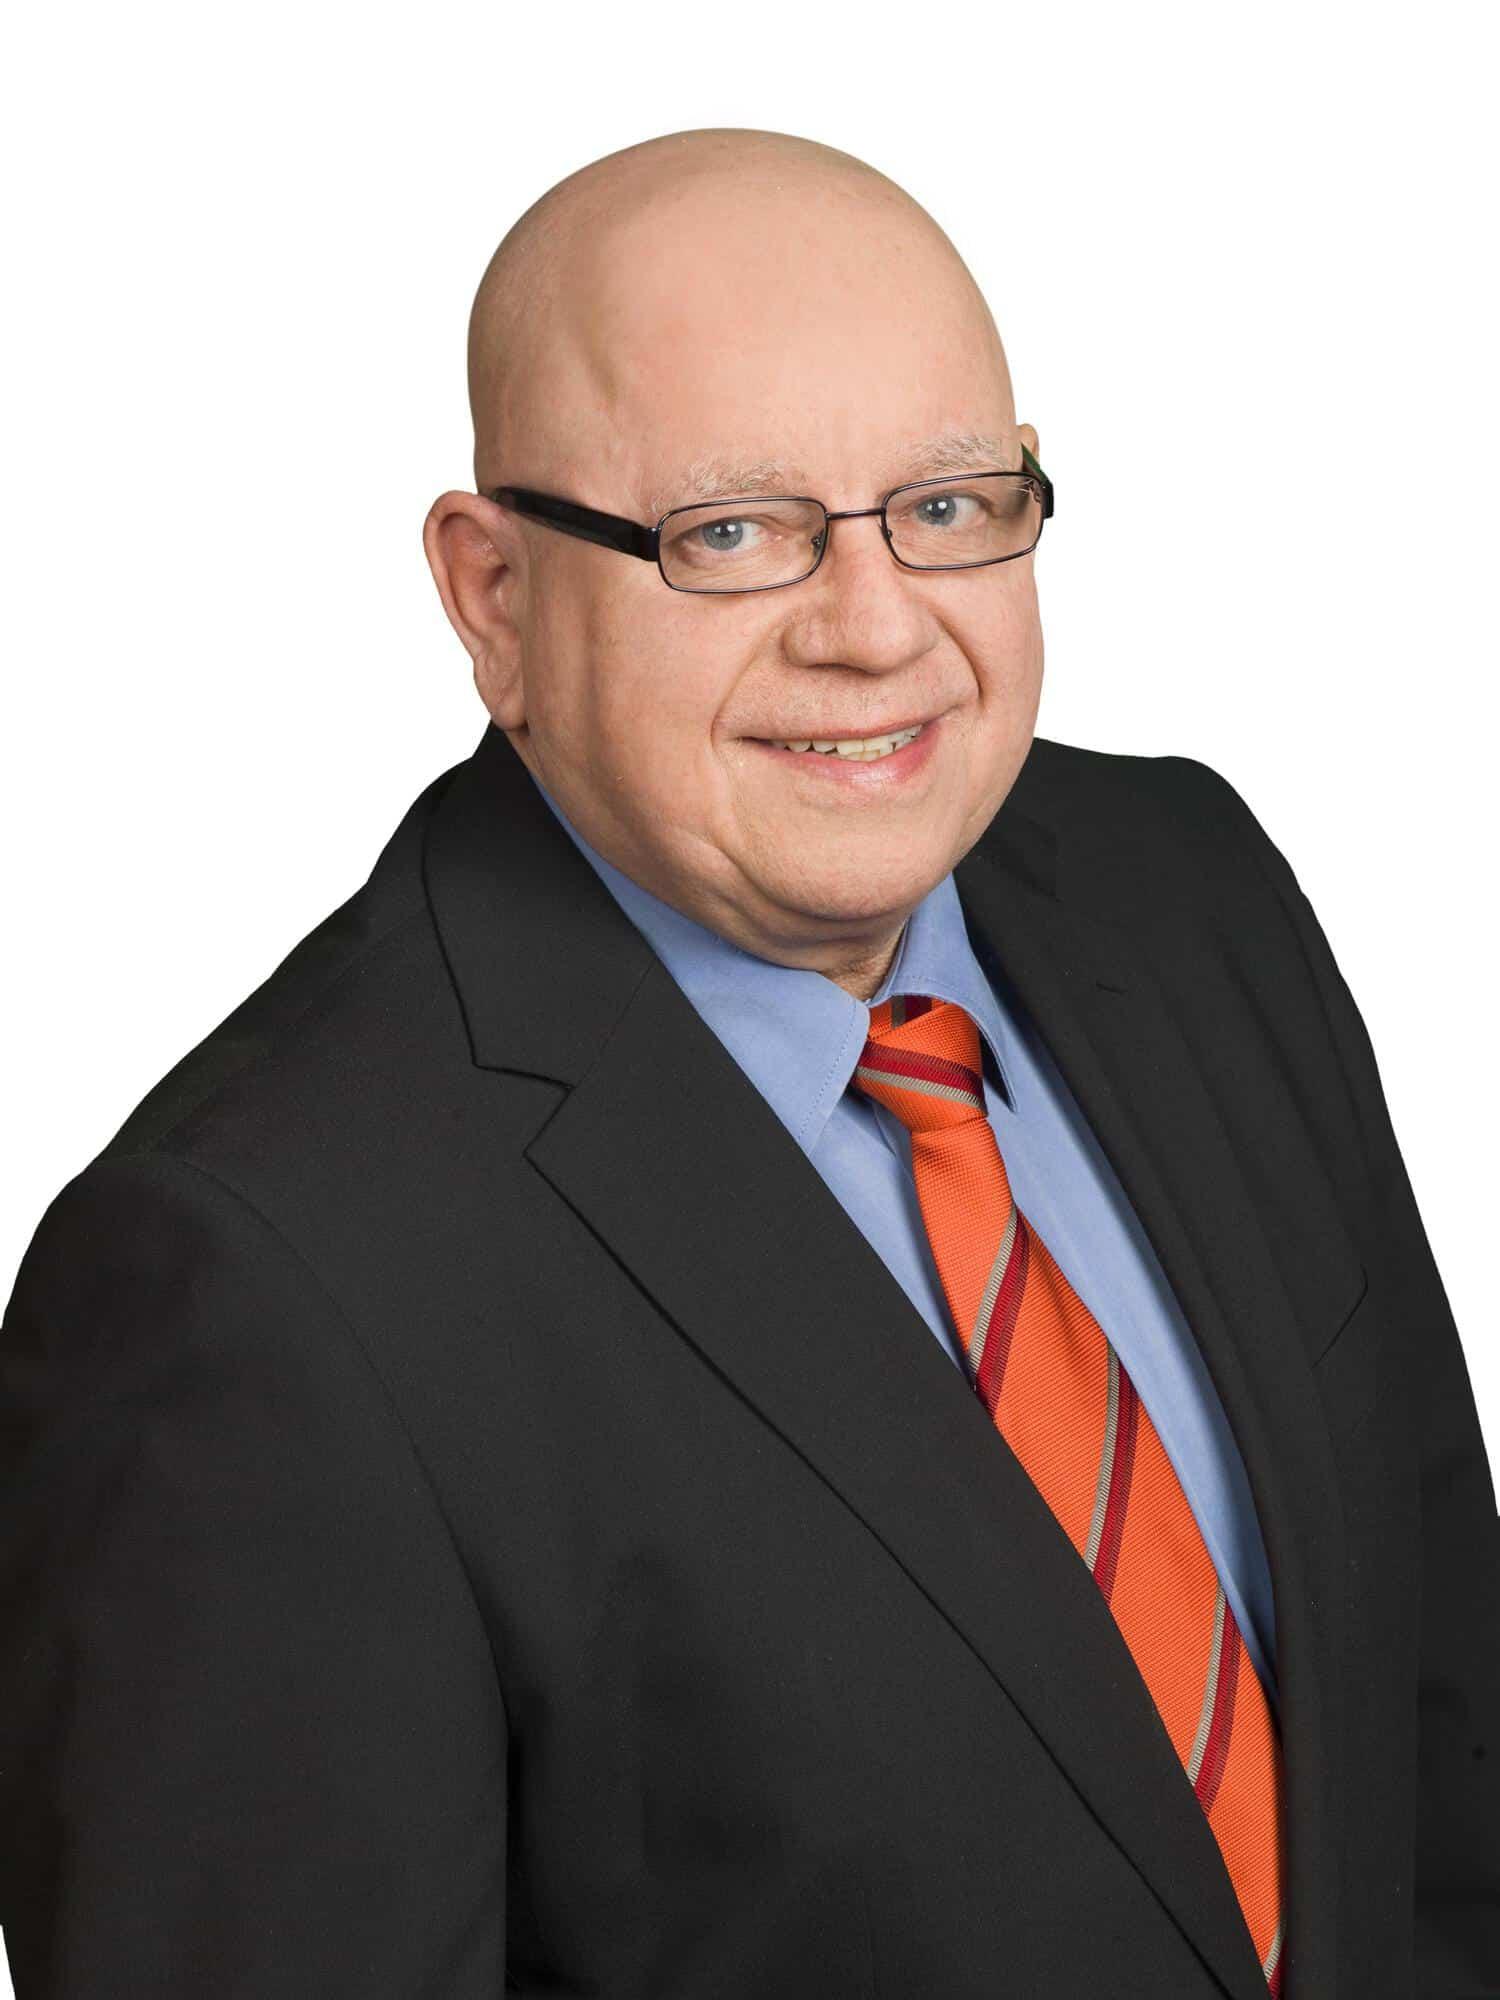 Rolf M. Braun